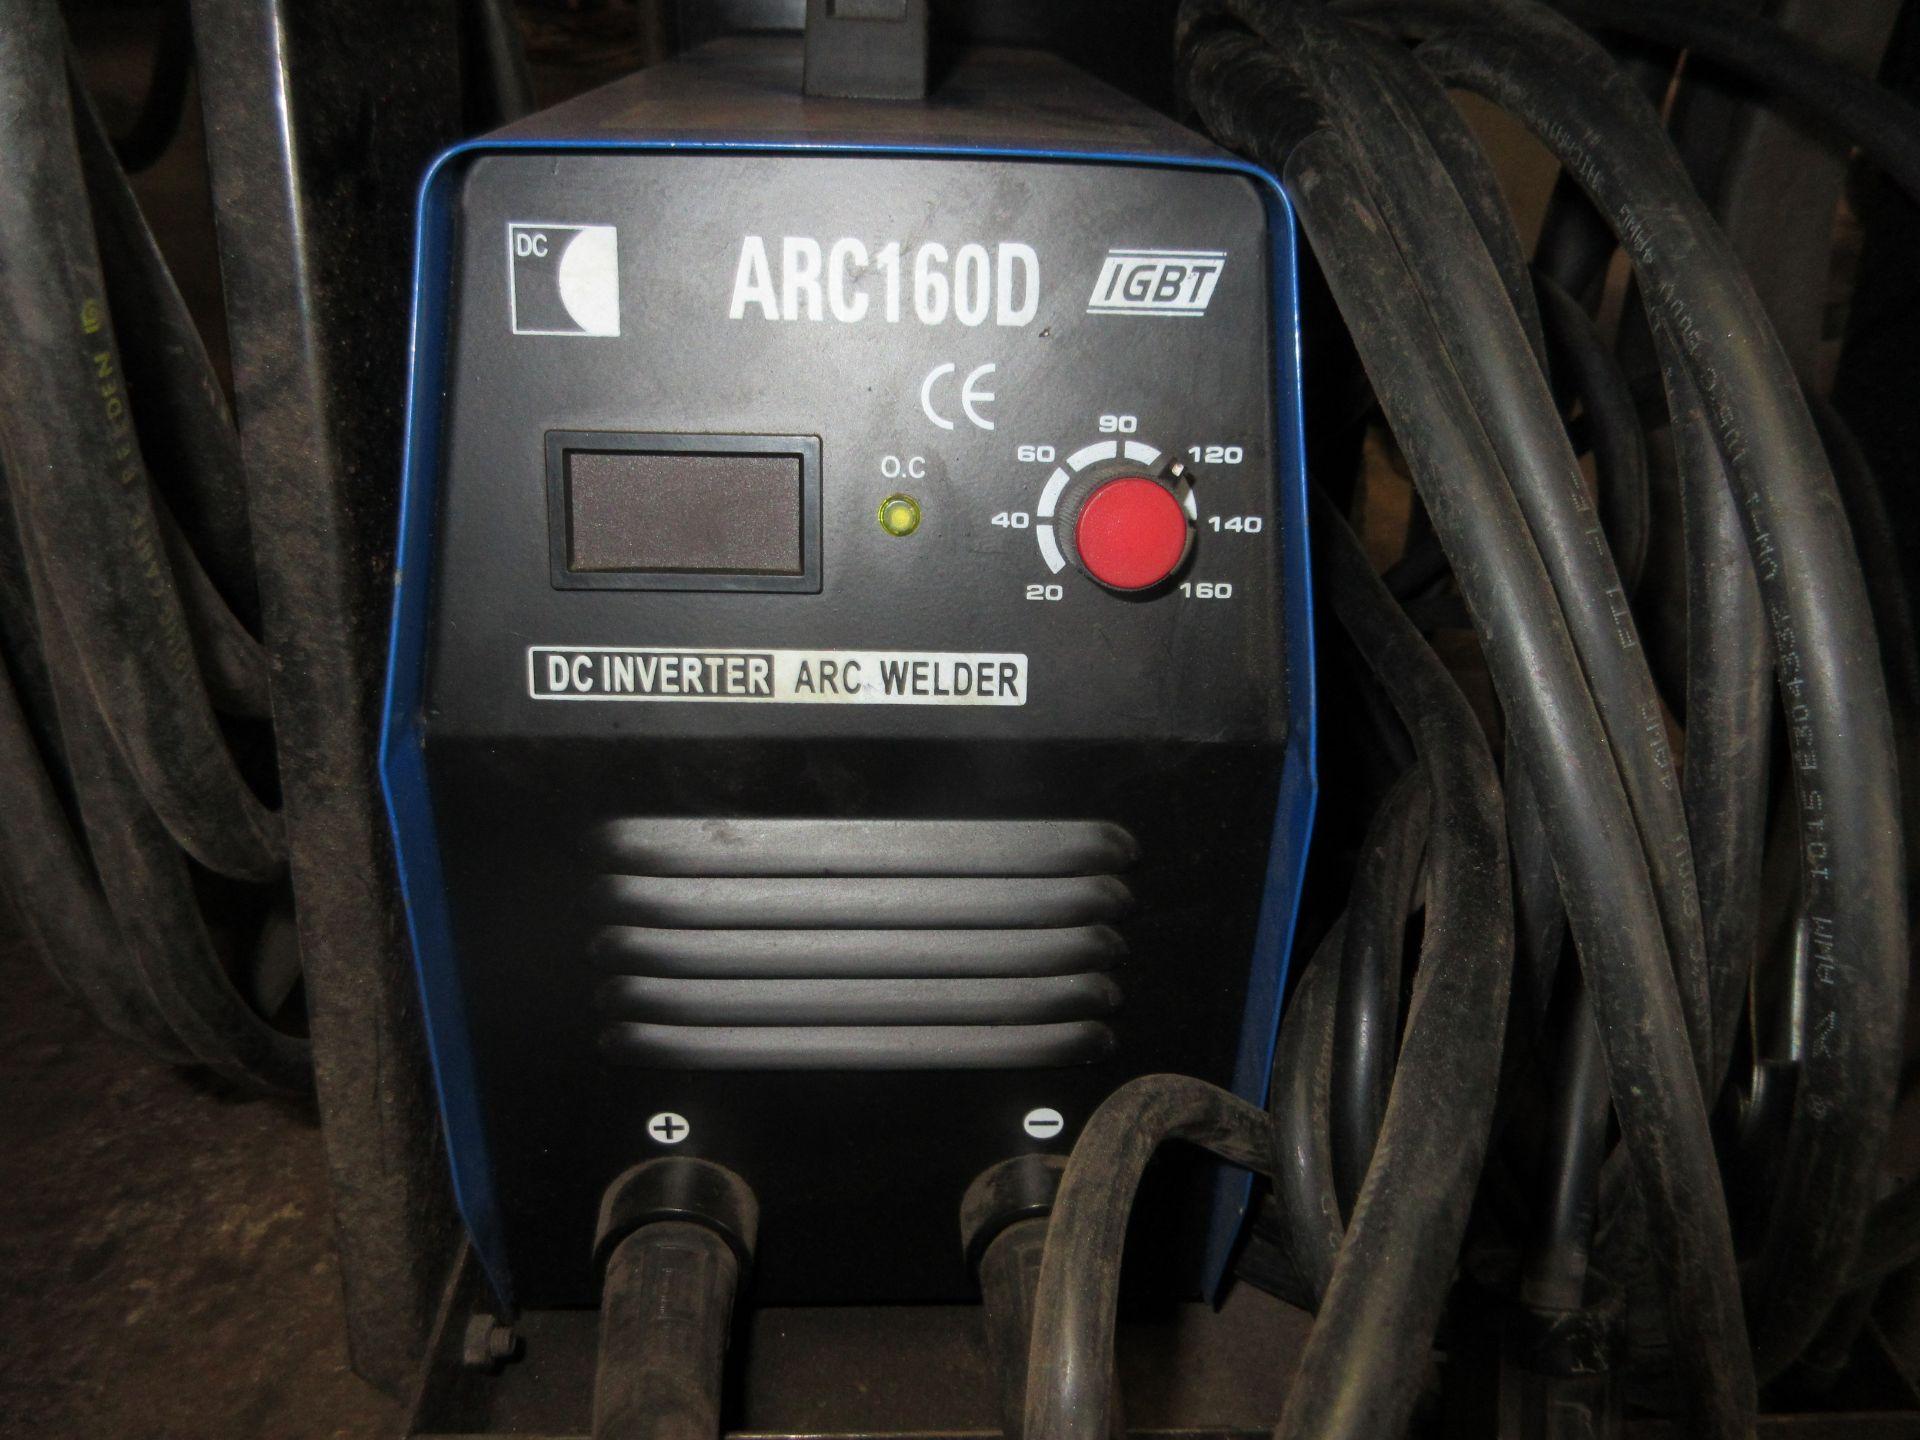 (1) IGBT Arc 160D Invertor Arc Welder w/ Chicago Electric Invertor Tig/Stick Welder, Foot Control - Image 2 of 5